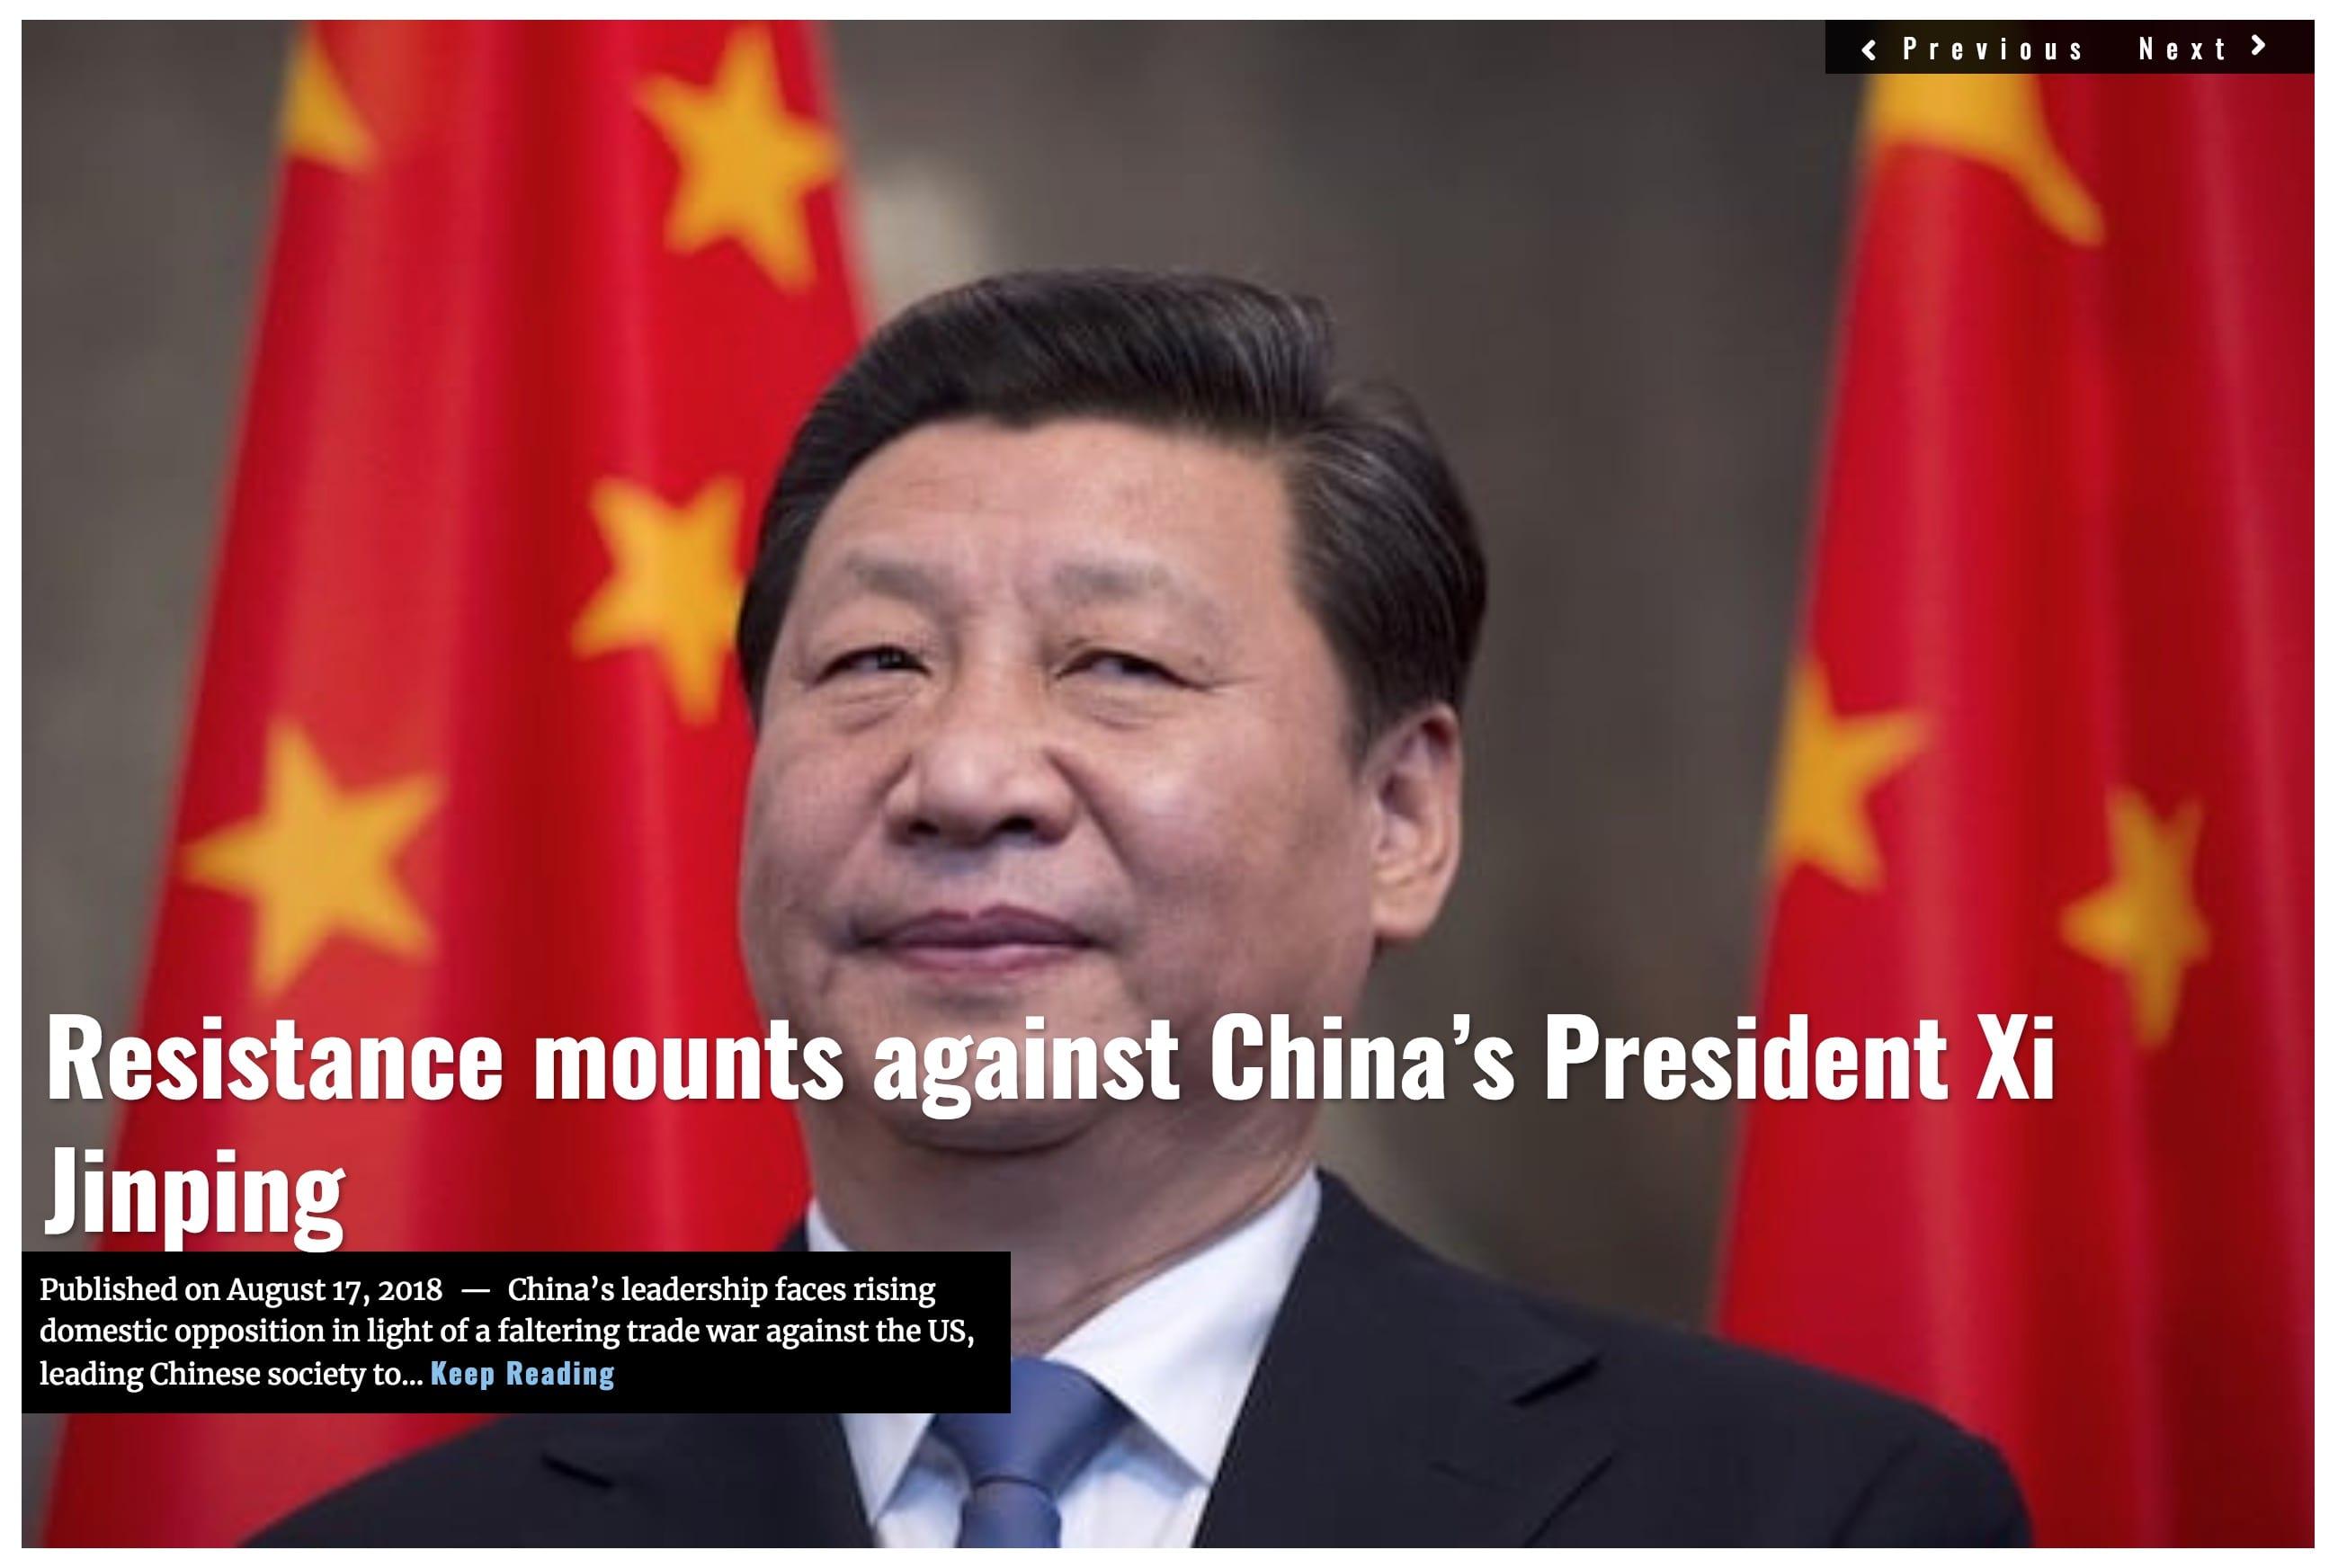 Image Lima Charlie News Headline China resistence J.Sjoholm AUG 17 2018